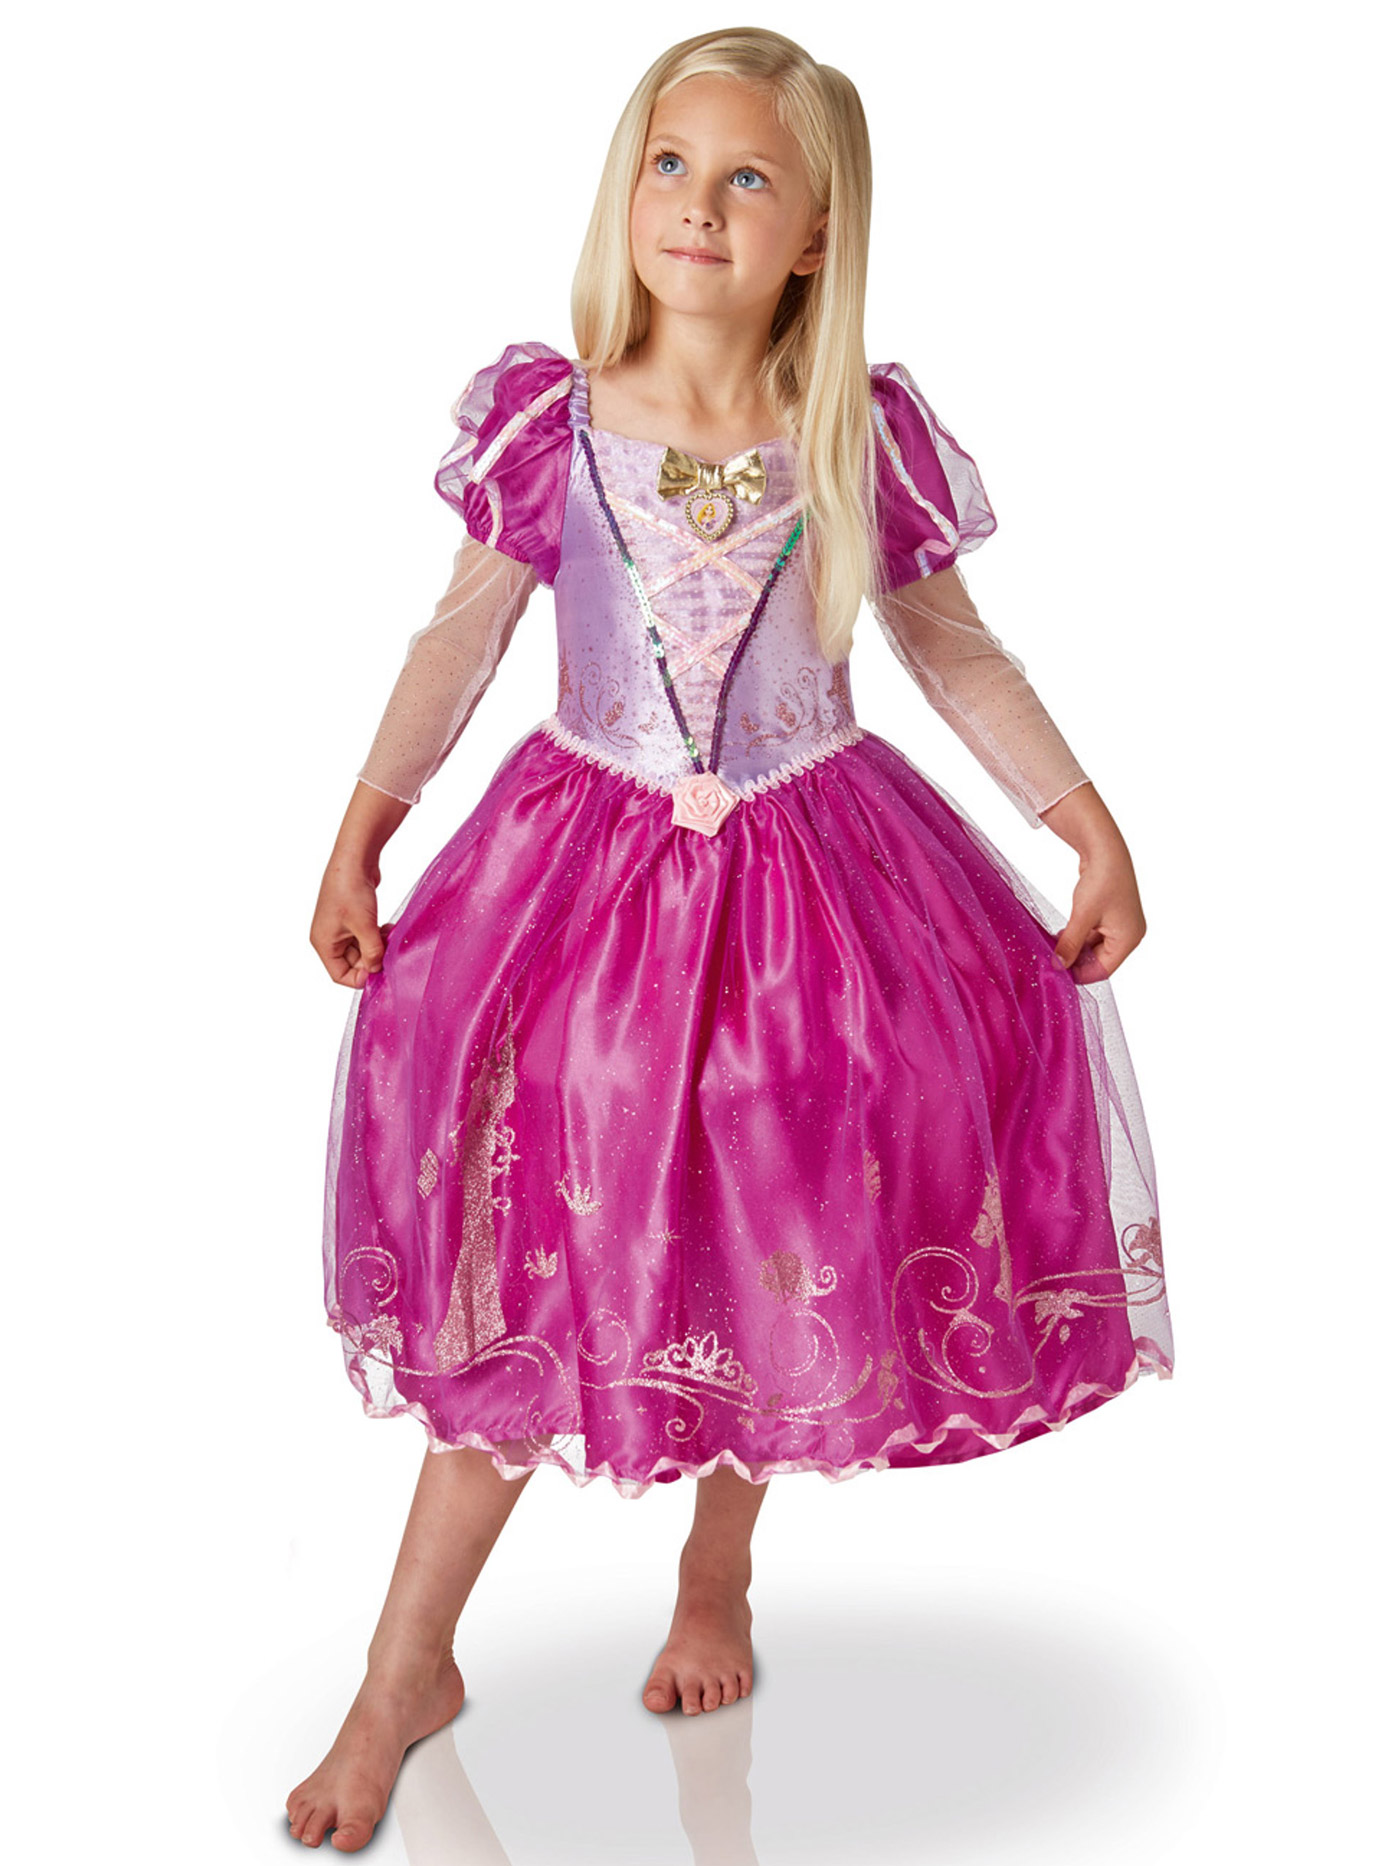 Offizielles Disneys Rapunzel Madchen Ballkleid Prinzessin Pink